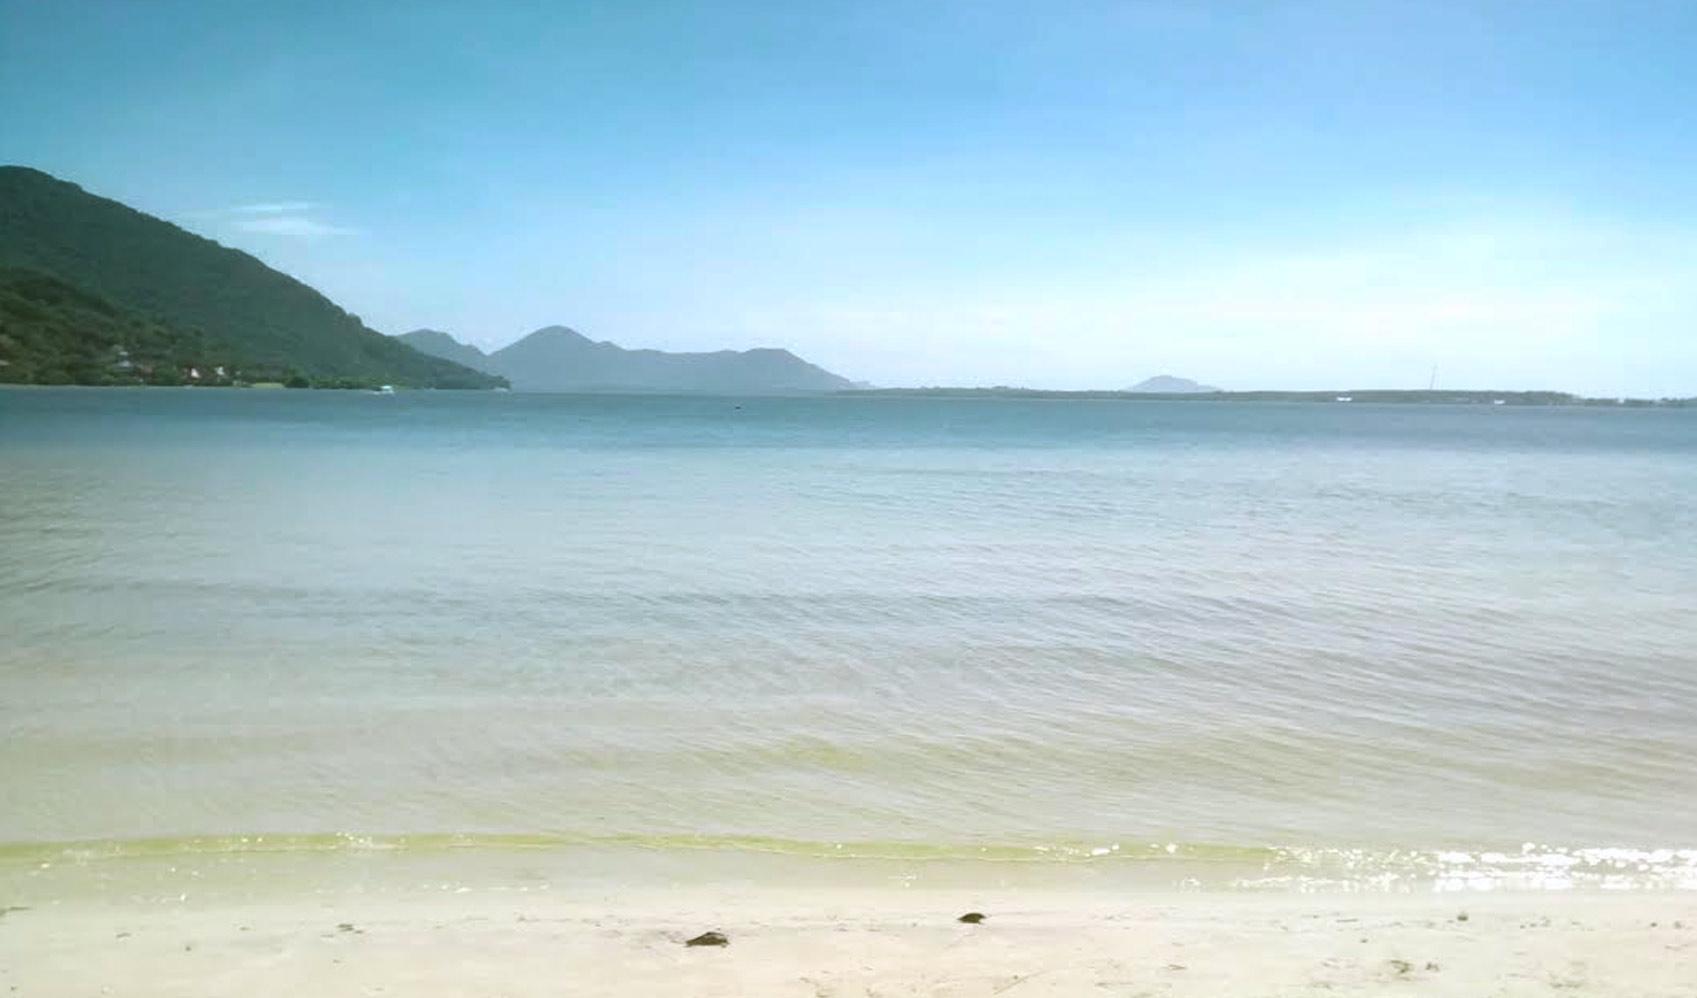 lagoa-da-conceicao